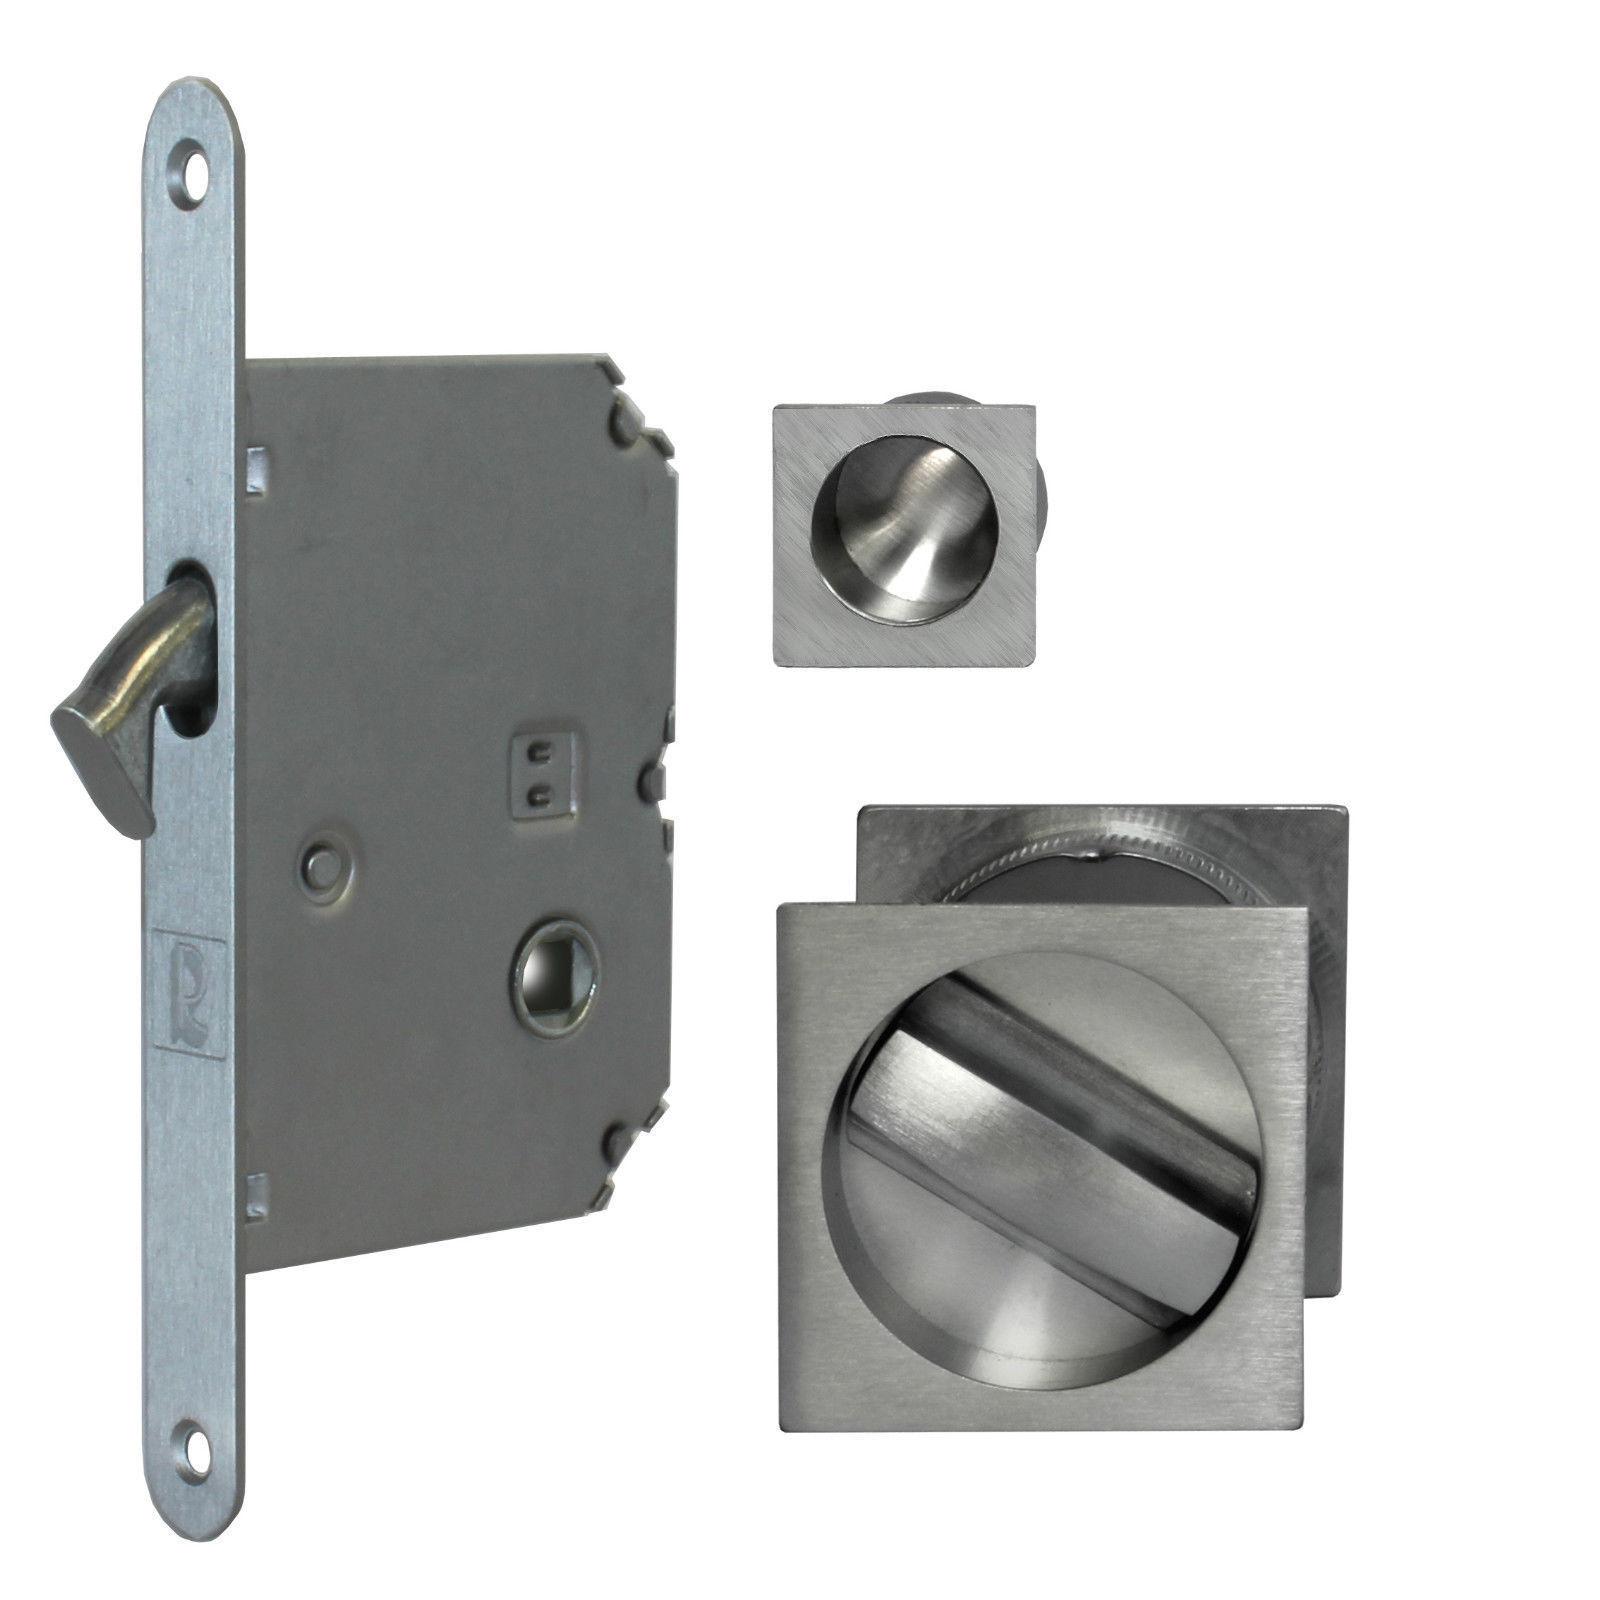 Jv829 Sliding Pocket Door Bathroom Lock Set Cw 2 Flush Pulls End